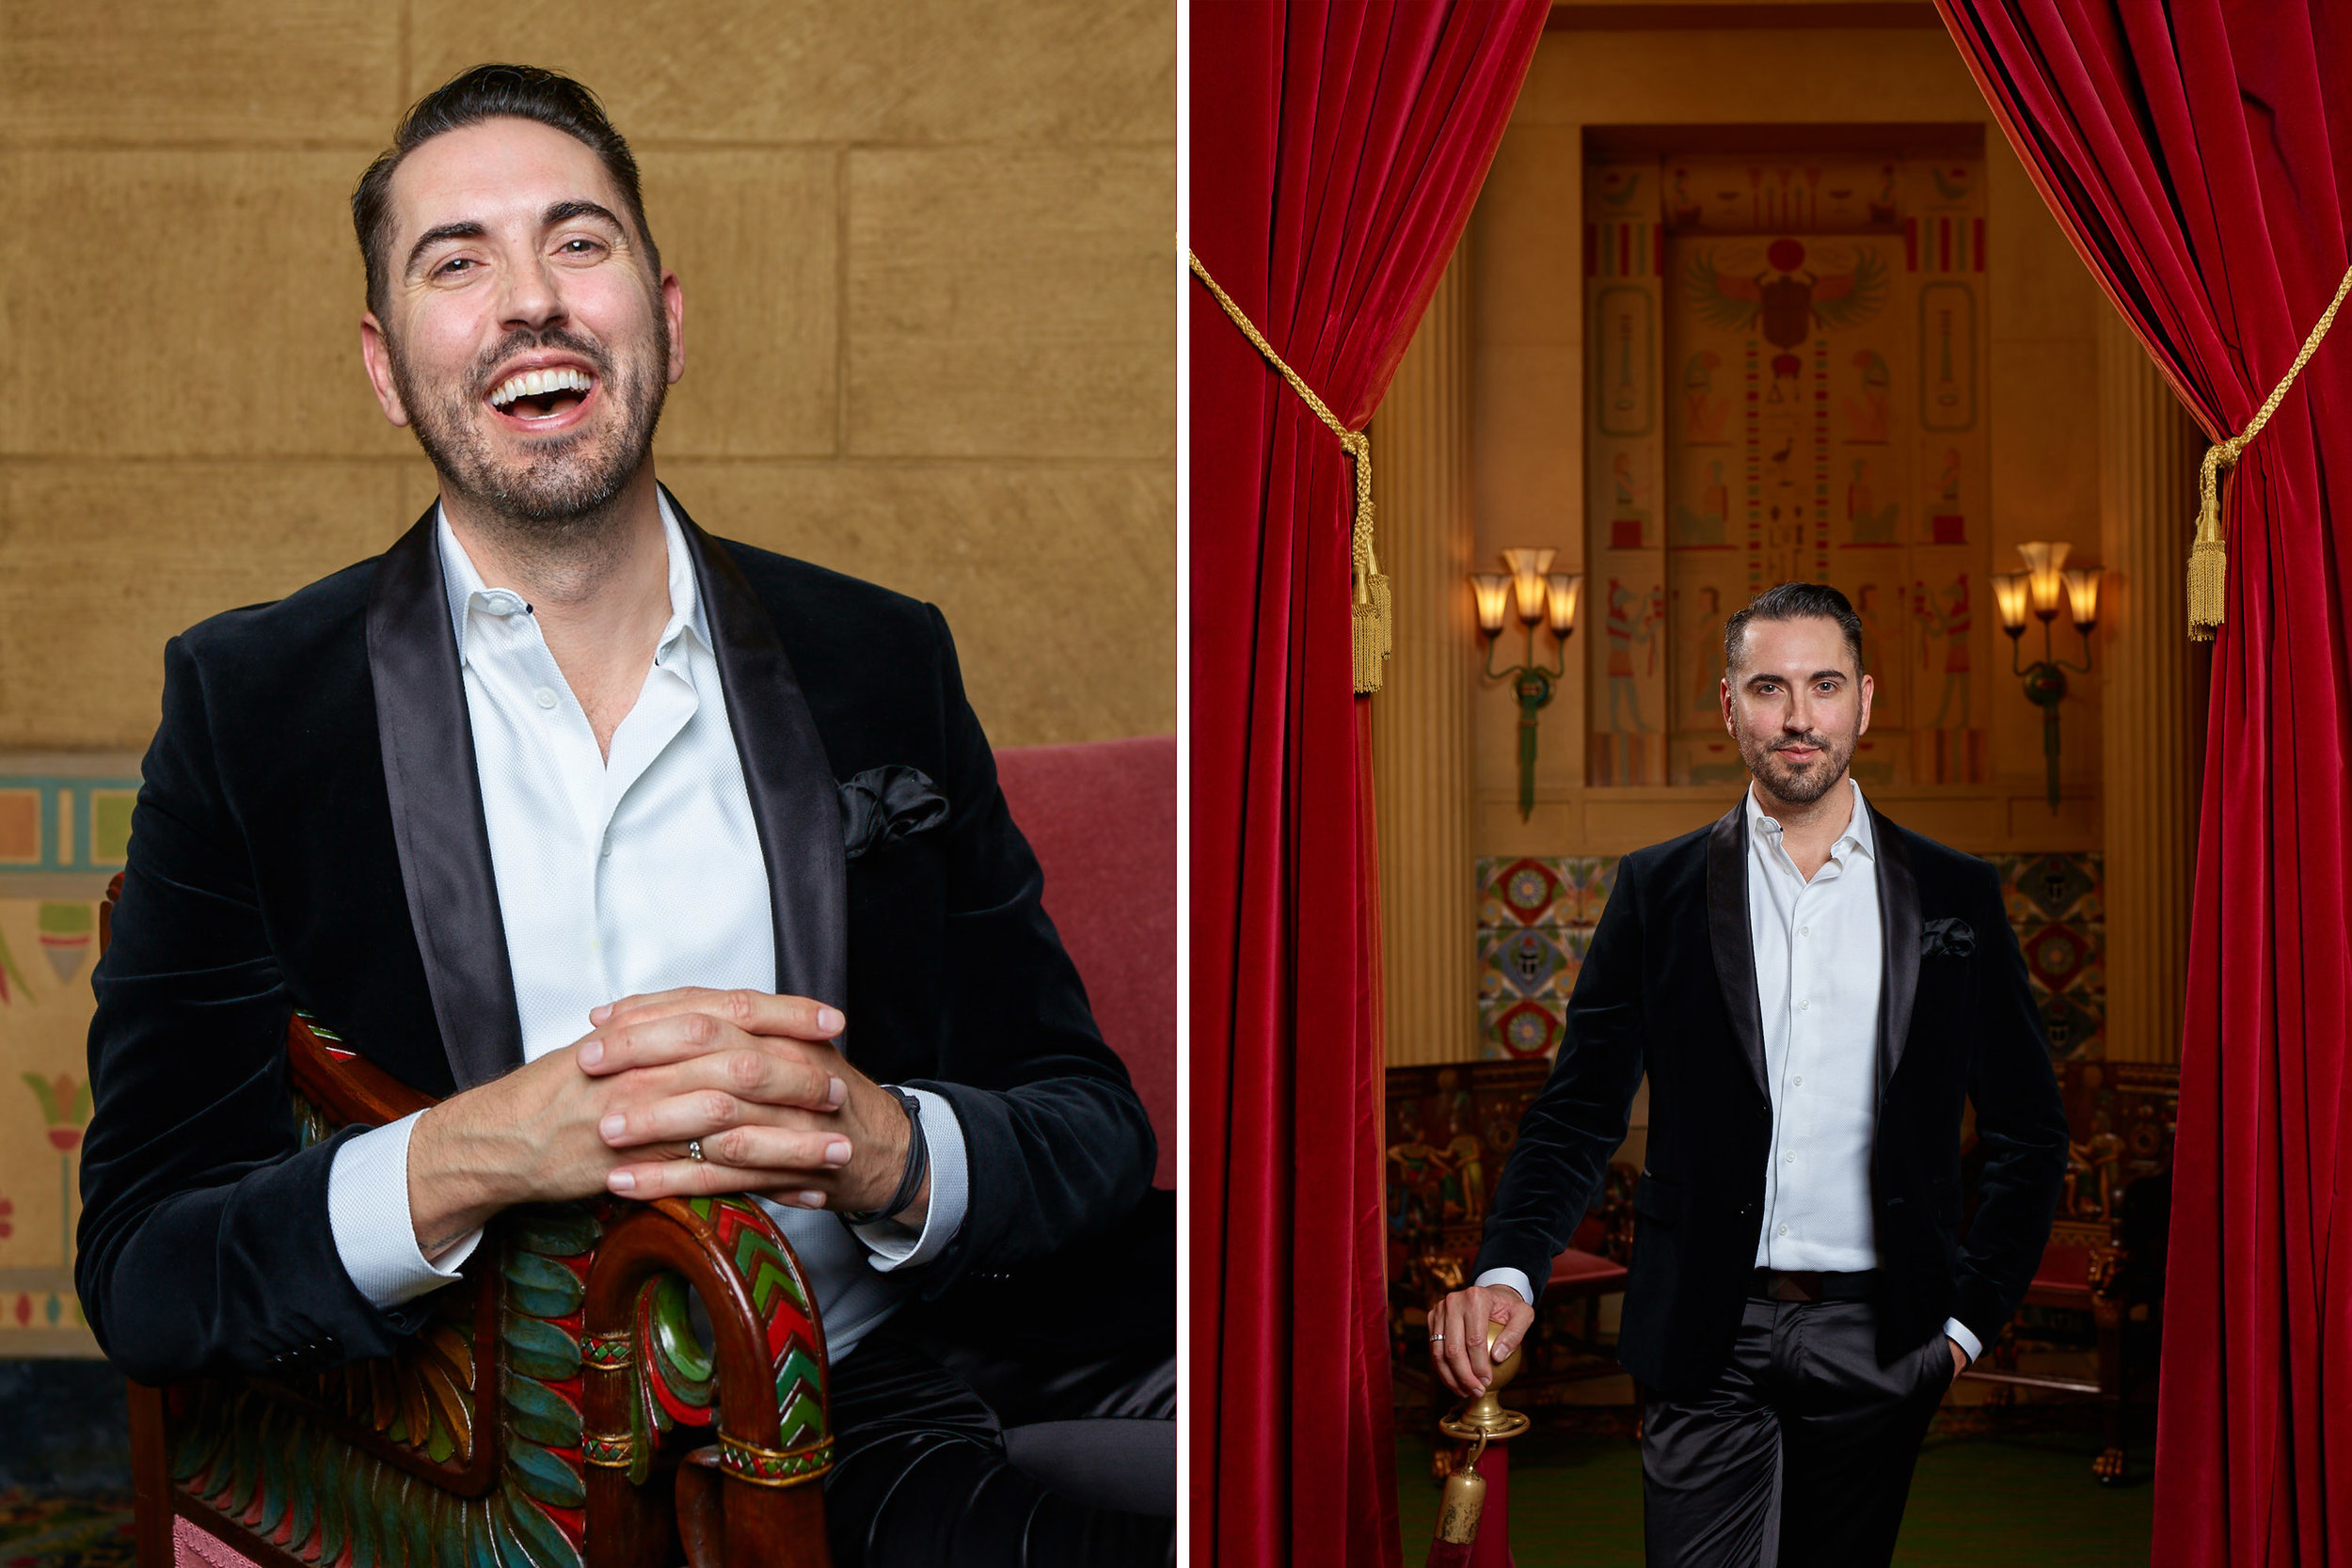 Brian Clowdus : Artistic Director of Serenbe Playhouse